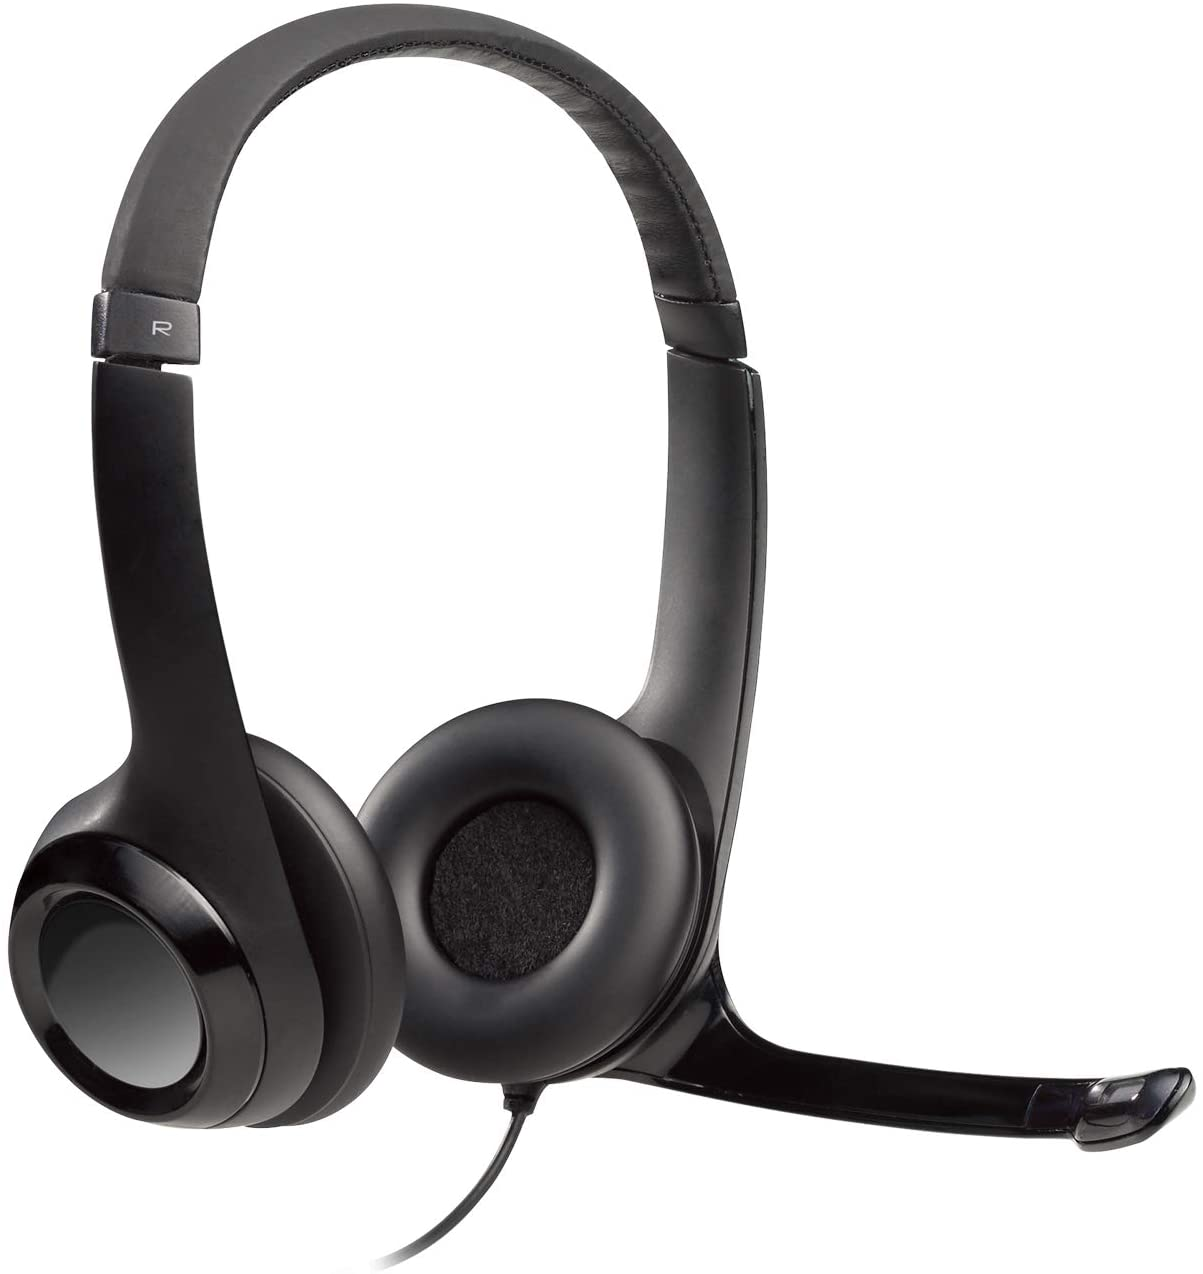 Logitech - best headset for dictation